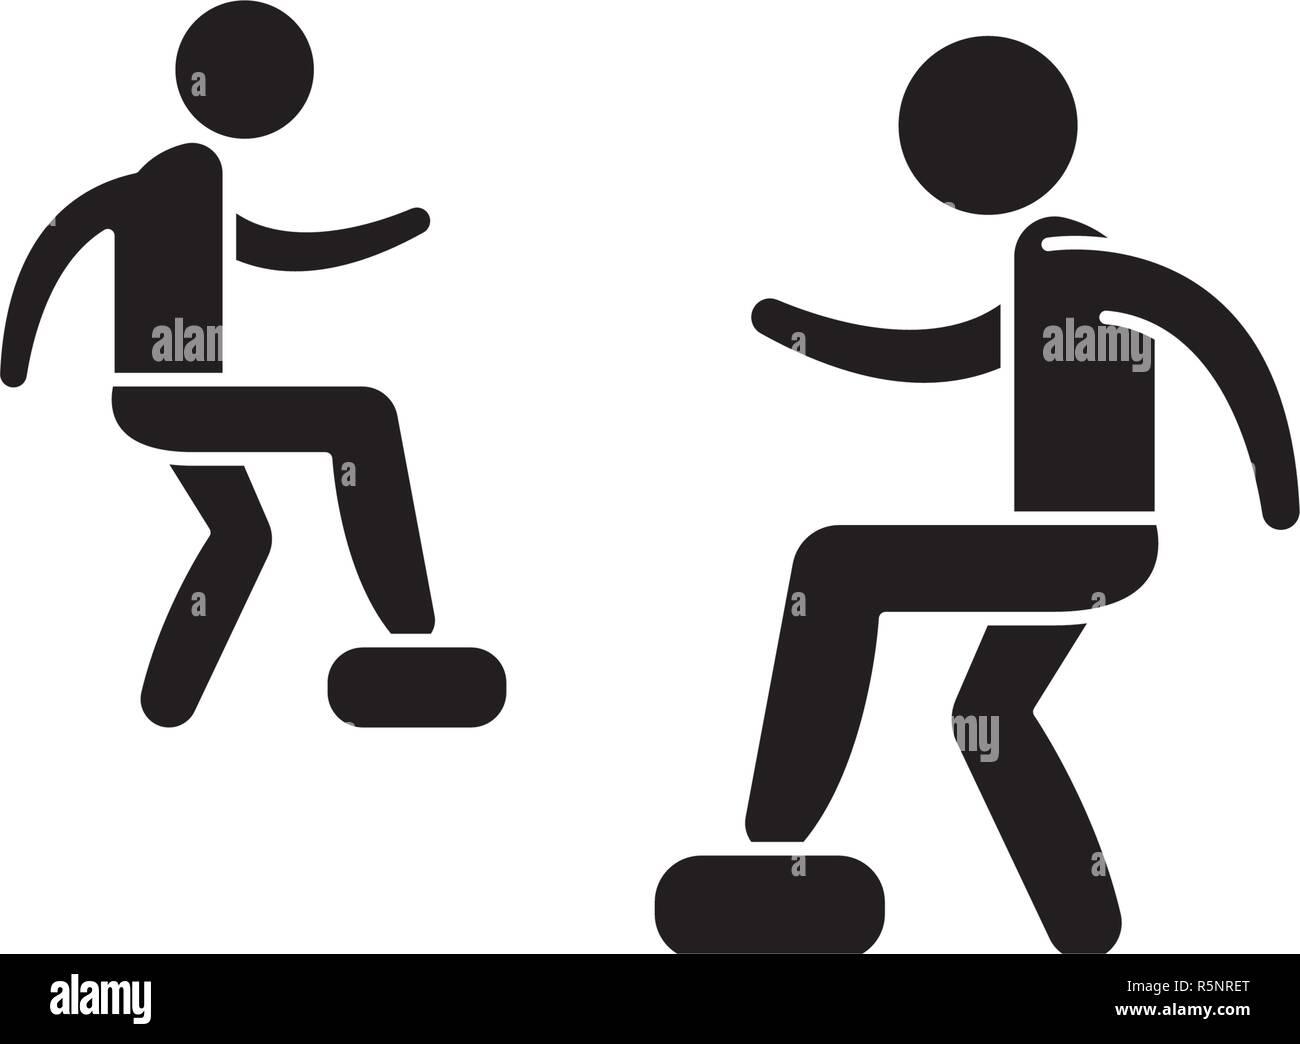 Cardio exercise black icon, vector sign on isolated background. Cardio exercise concept symbol, illustration  - Stock Image